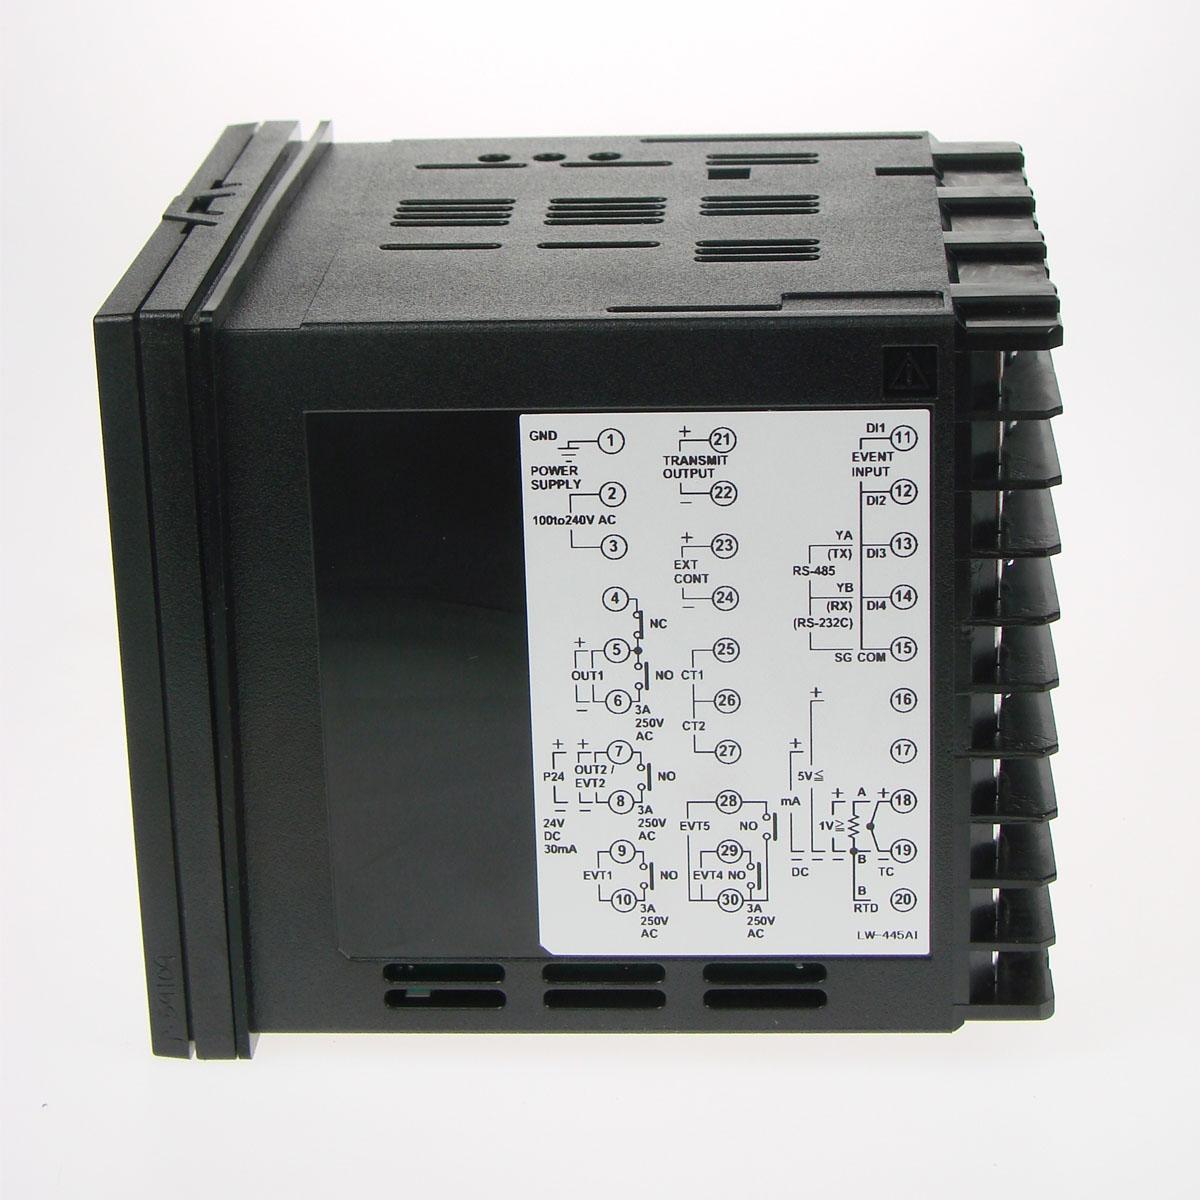 SHINKO ACD / ACR SERIES เครื่องวัด-ควบคุมอุณหภูมิและค่าทางไฟฟ้าแบบดิจิตอล